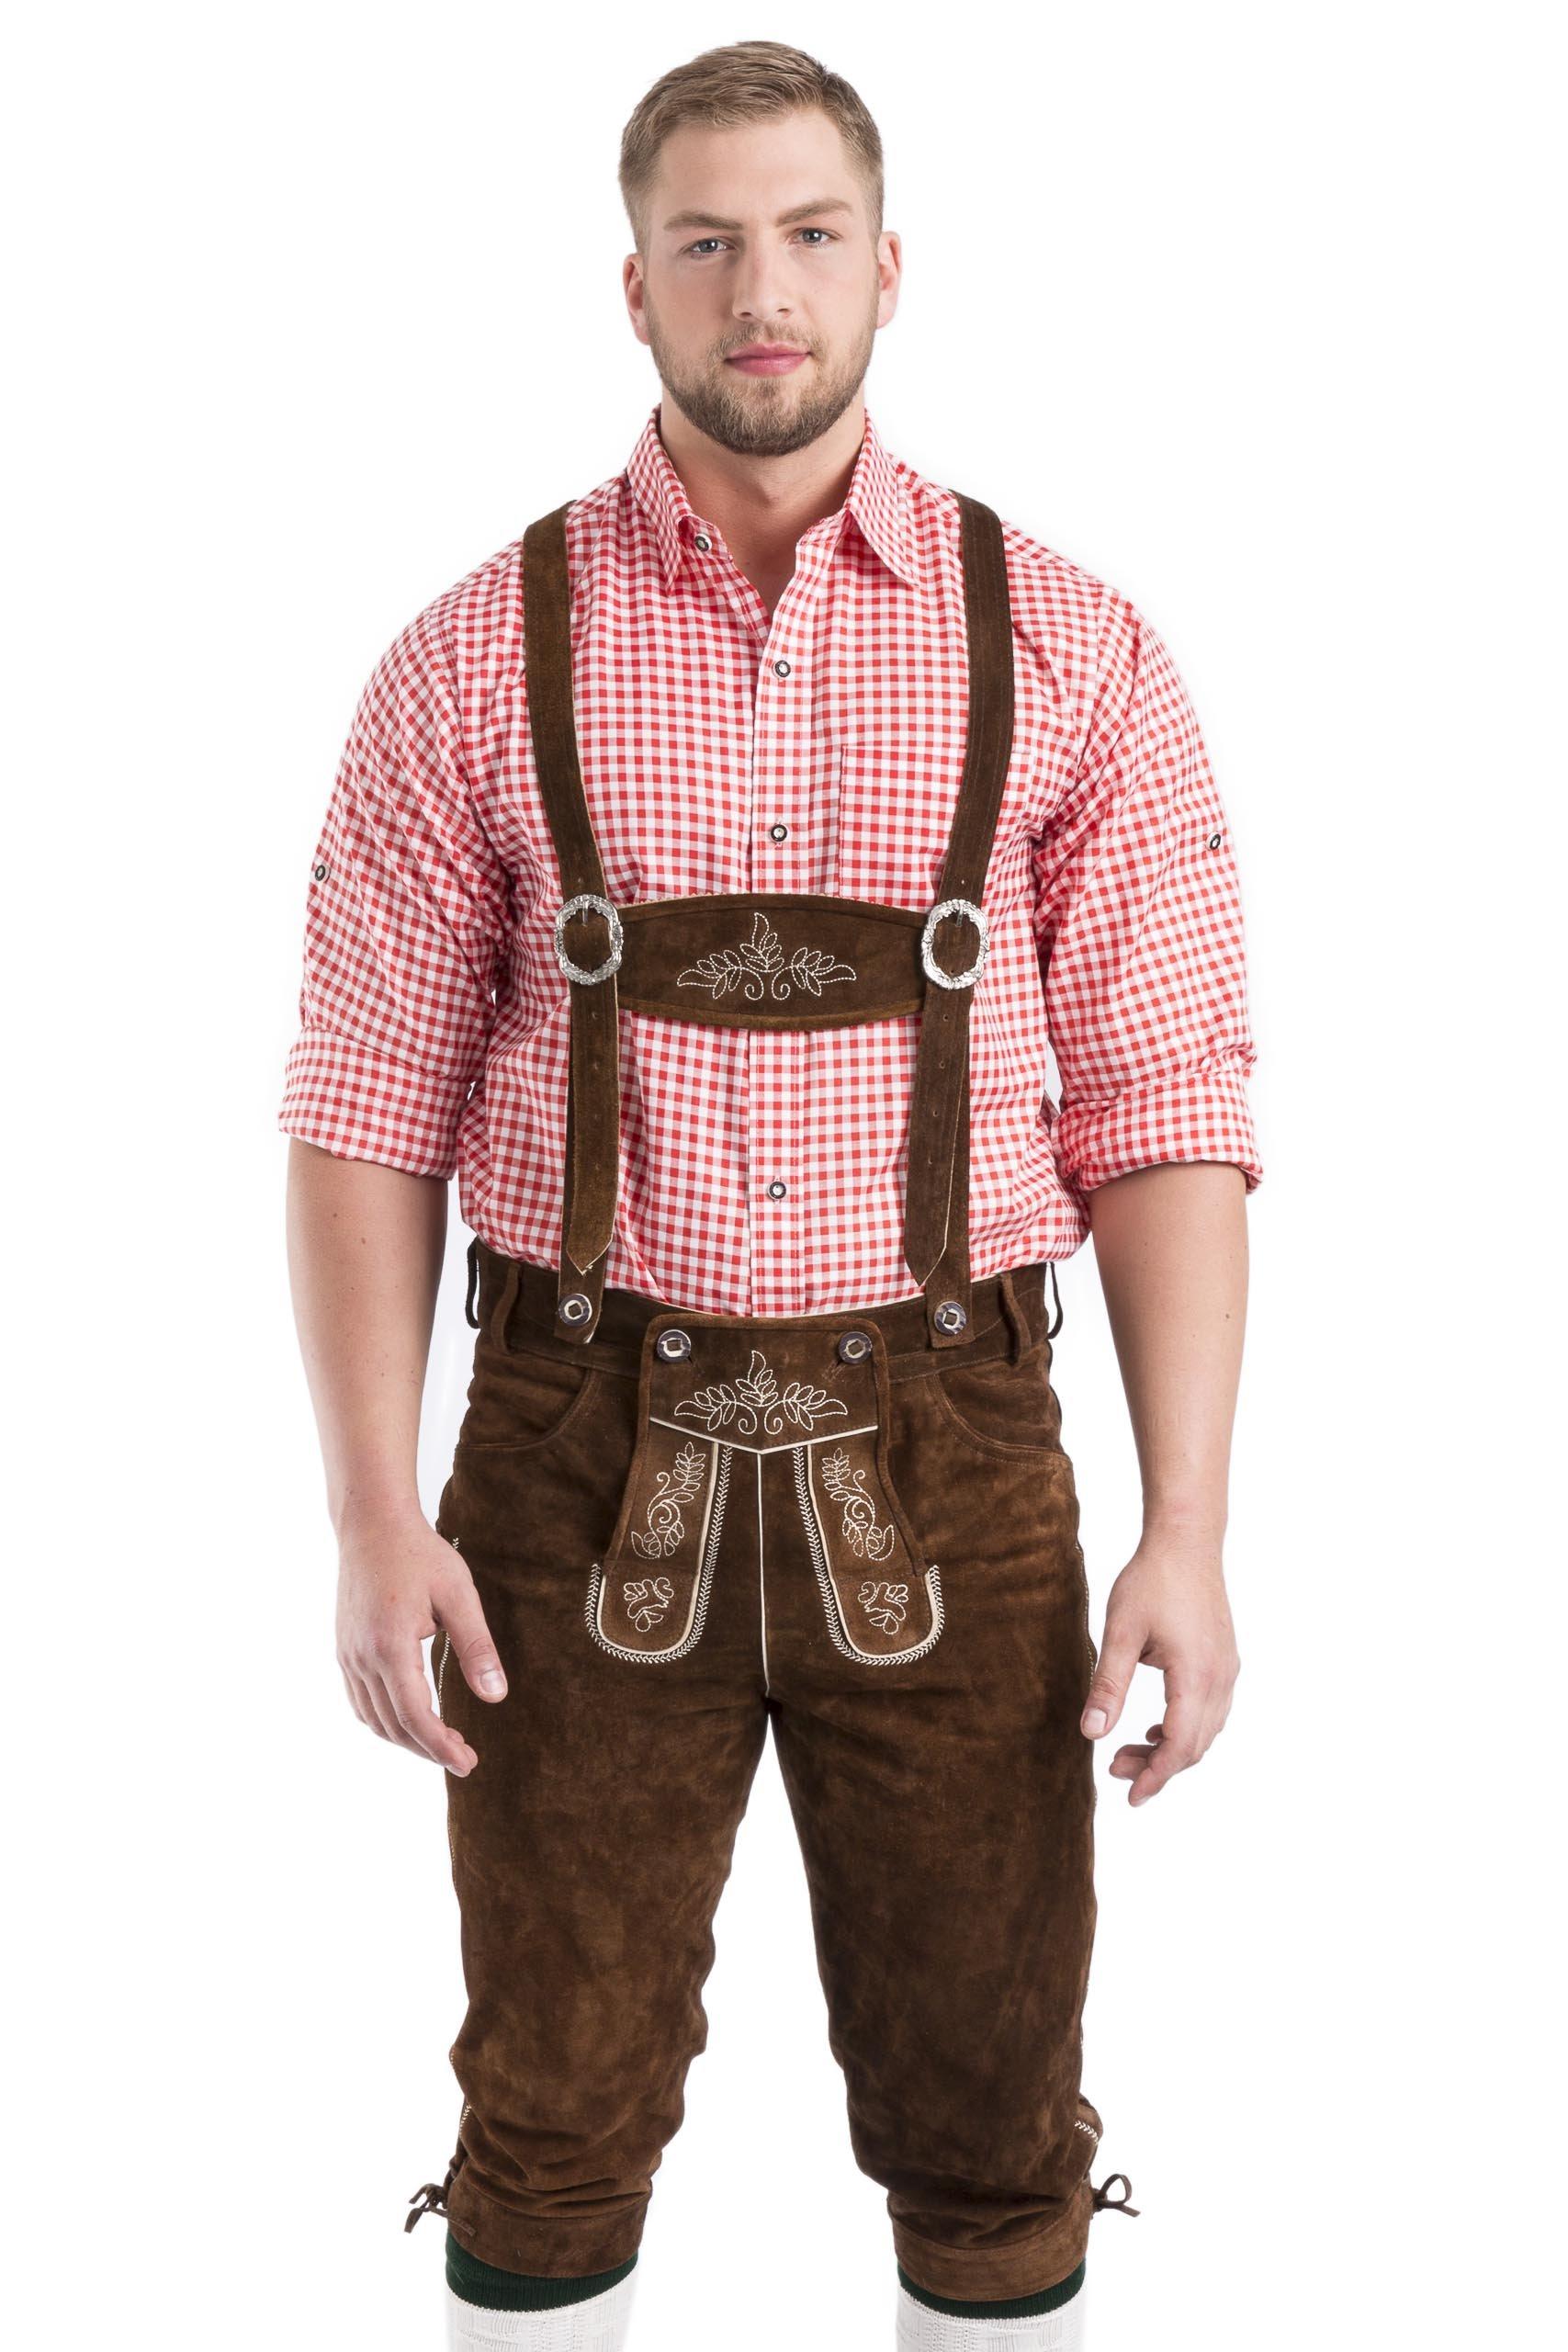 Men's German Oktoberfest Lederhosen - Knee Breeches Leather Trouser